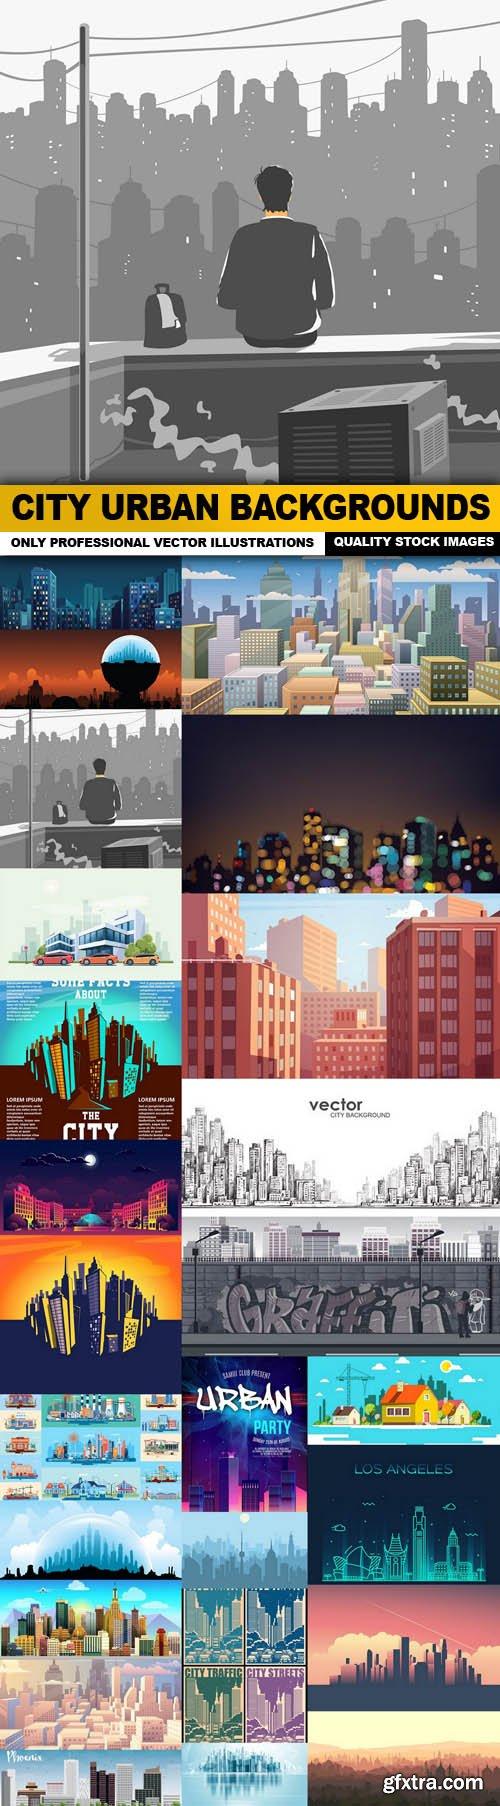 City Urban Backgrounds - 25 Vector